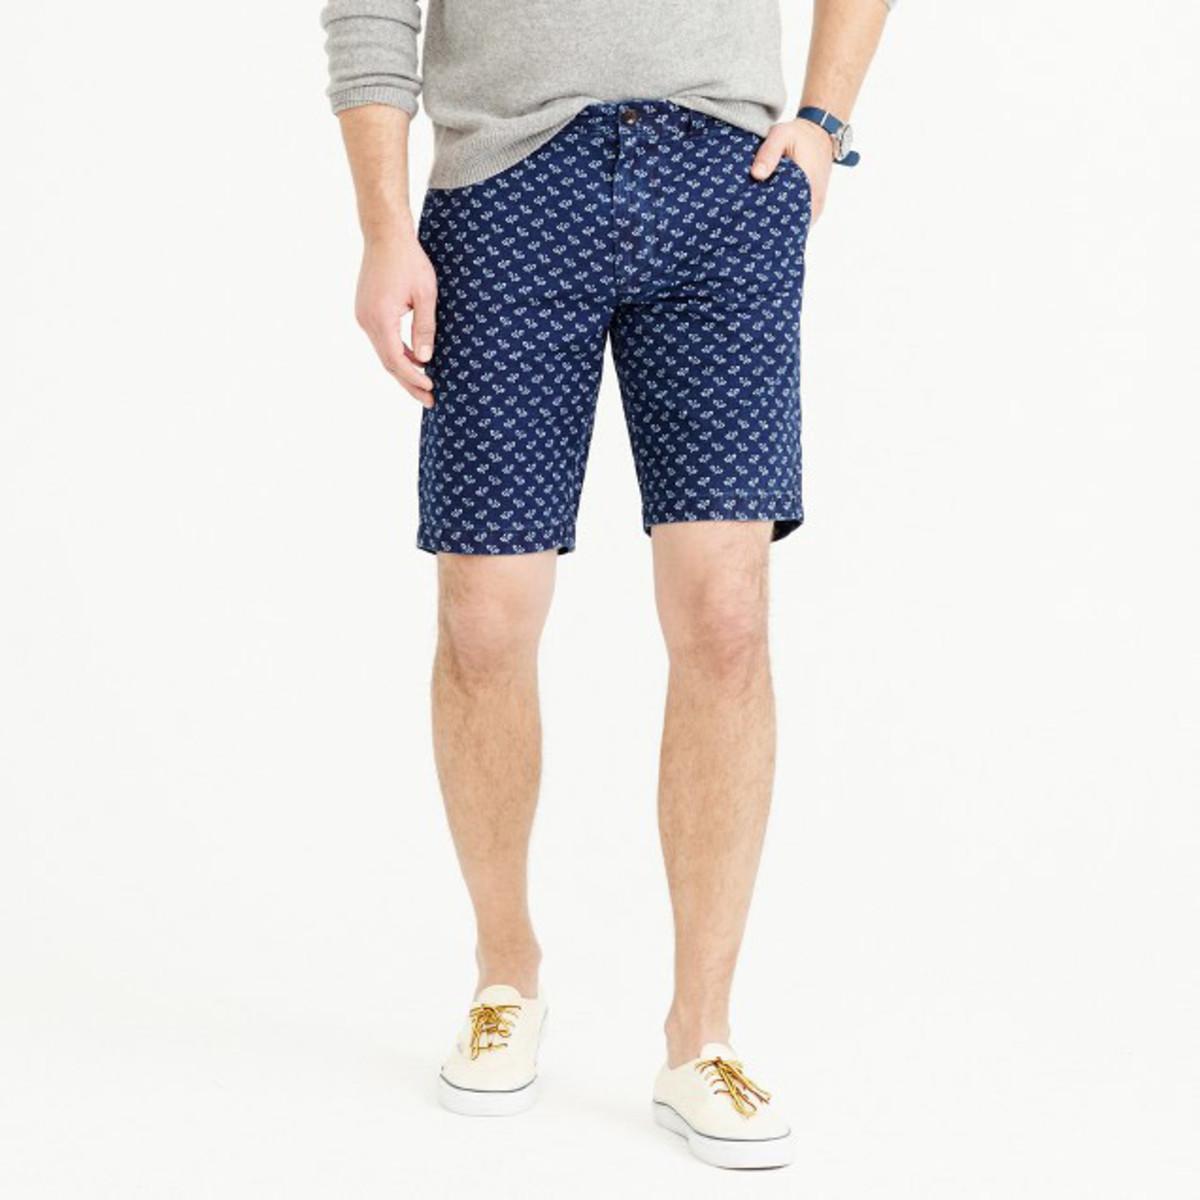 jcrew-floral-shorts.jpg